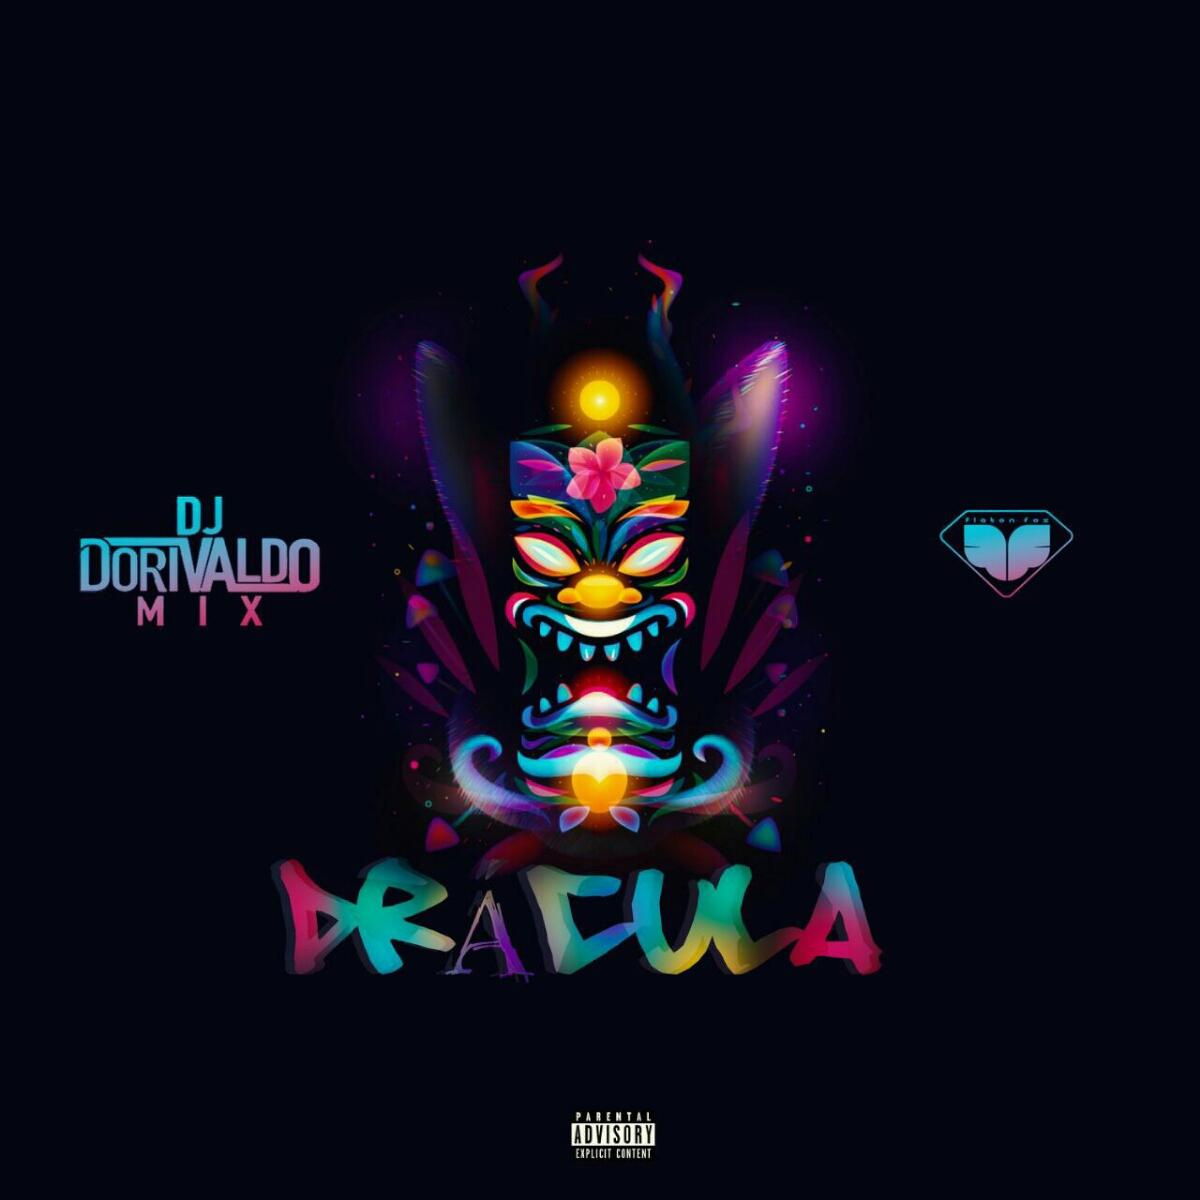 2019 St Dj Songs Dowode 4 33 Mb: Dj Dorivaldo Mix & Dj Flaton Fox